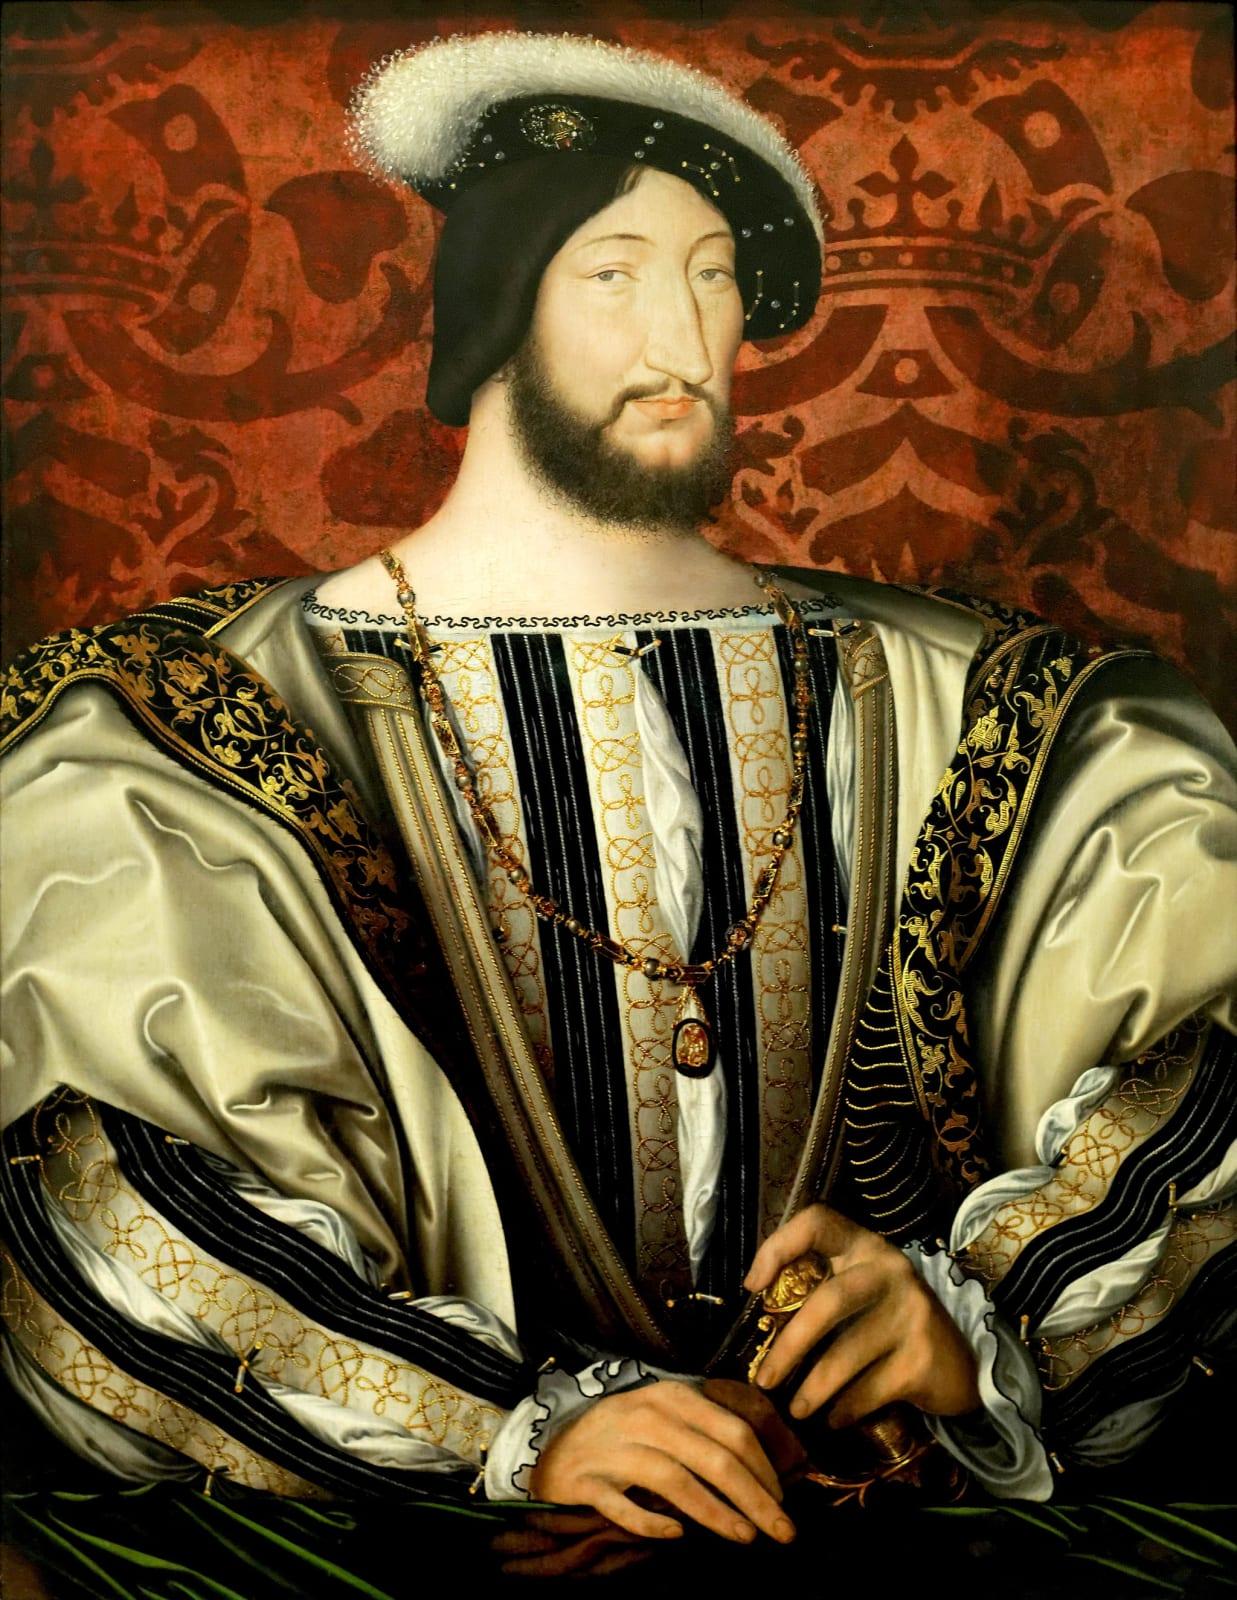 Madeleine's father, Francois I of France (1494 - 1547)